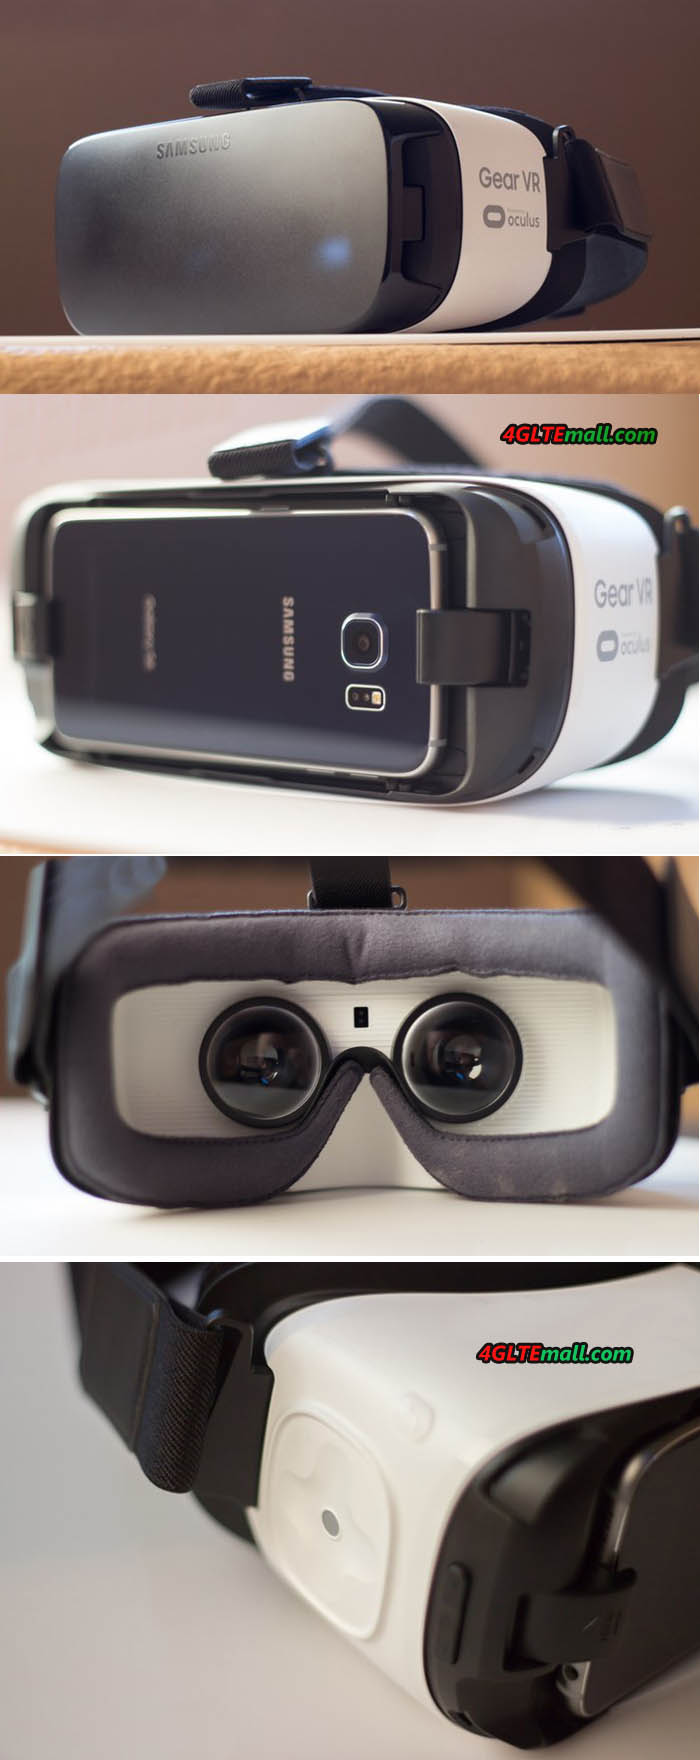 Samsung Gear VR 3D Box Details